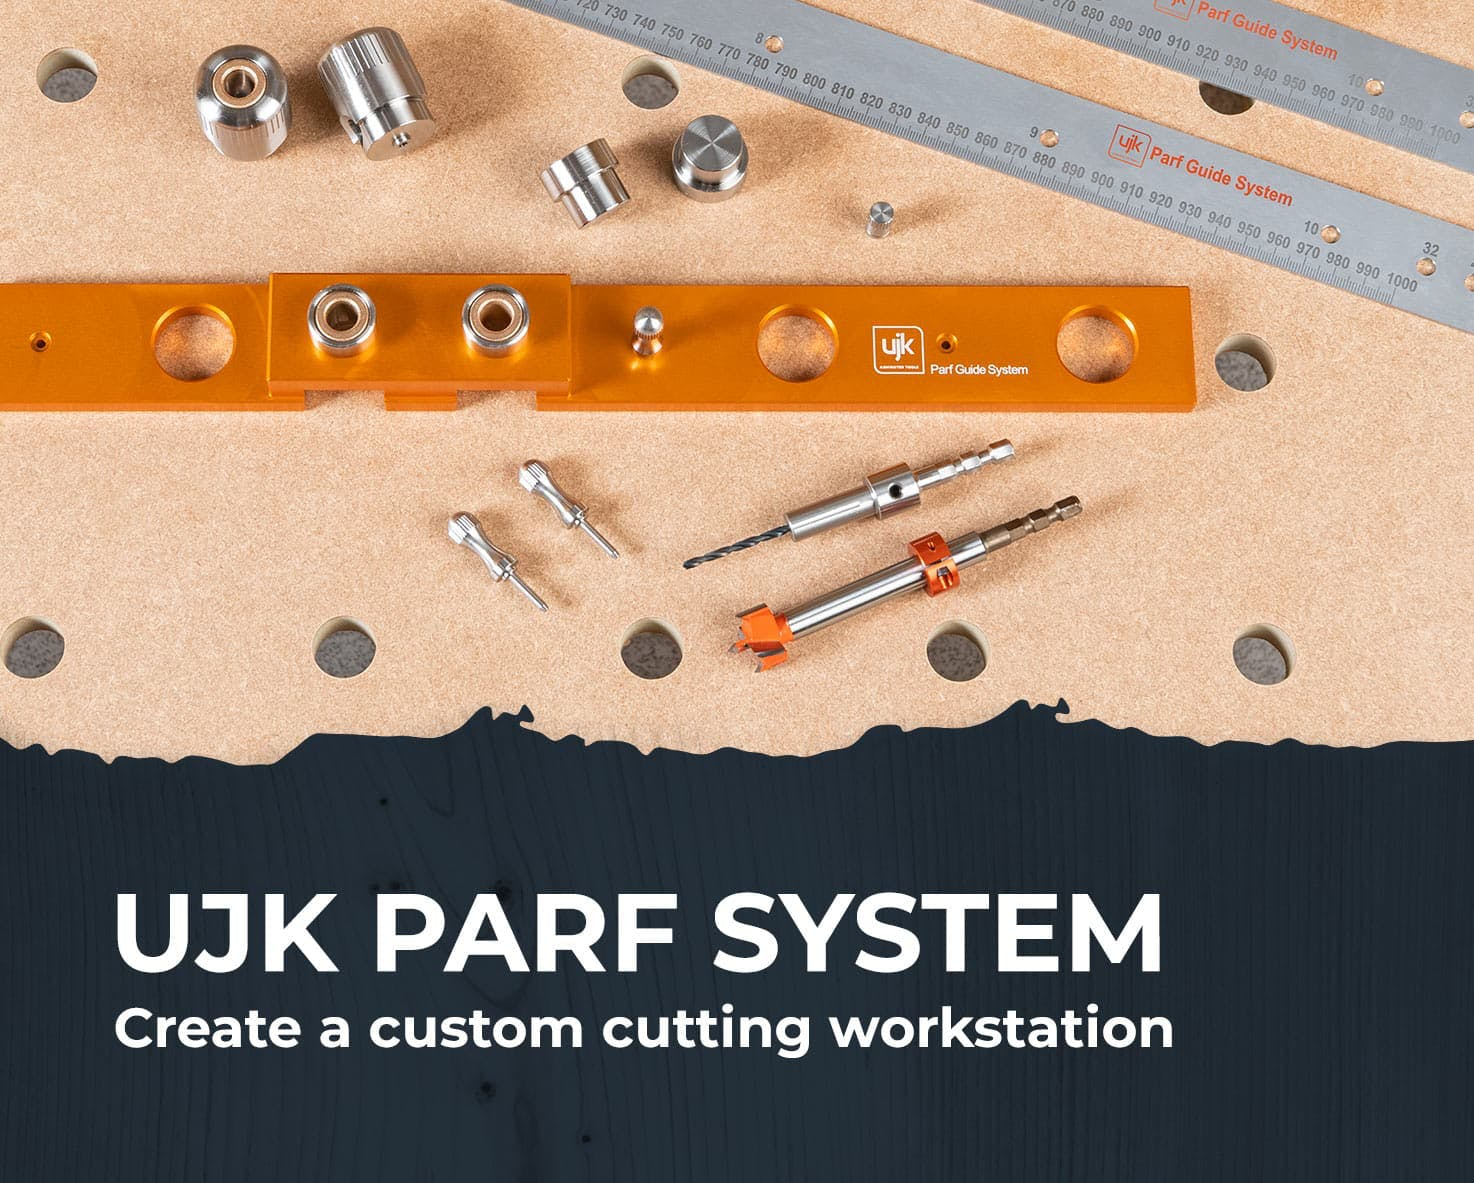 Parf Mk II Guide System